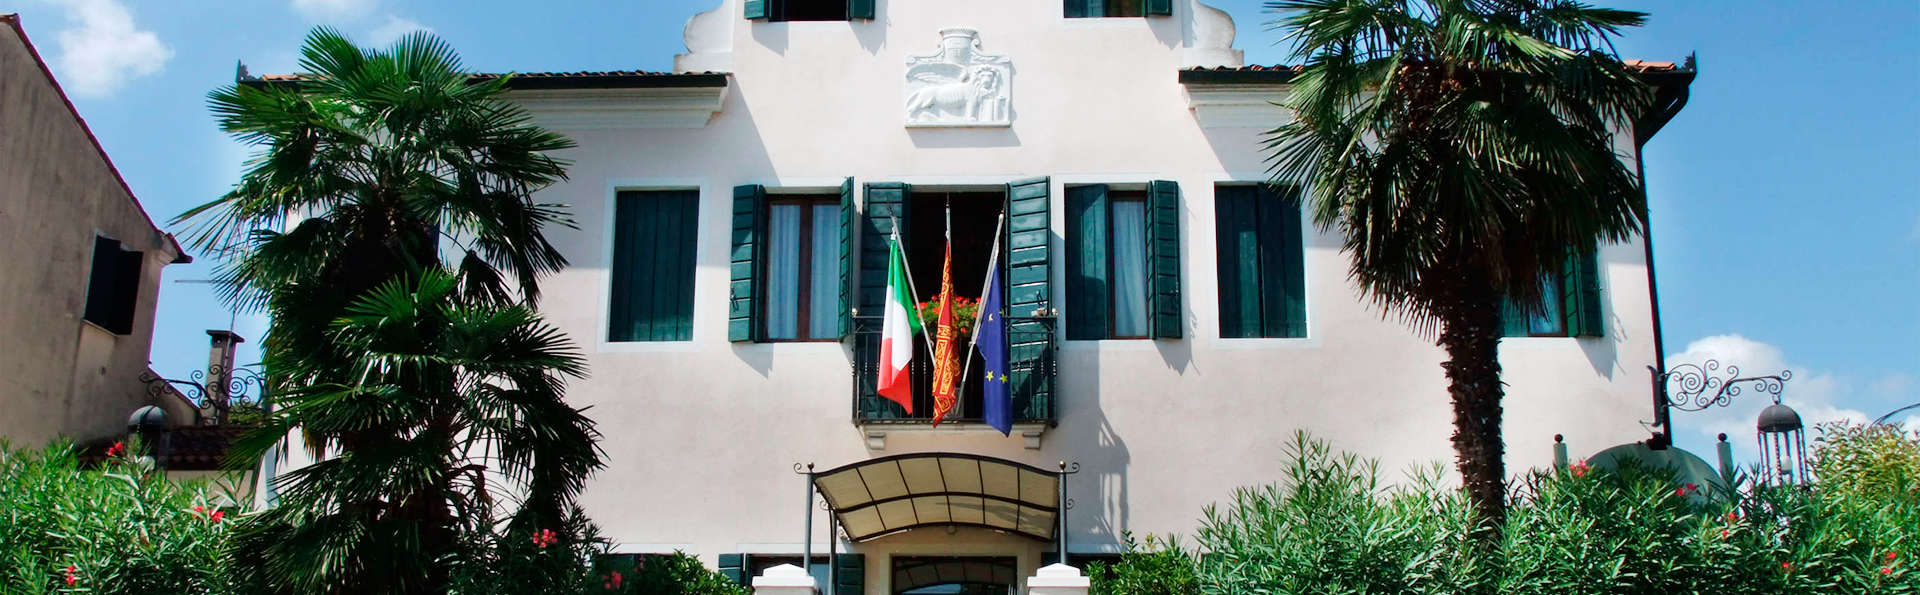 Hotel Villa Gasparini - EDIT_front.jpg